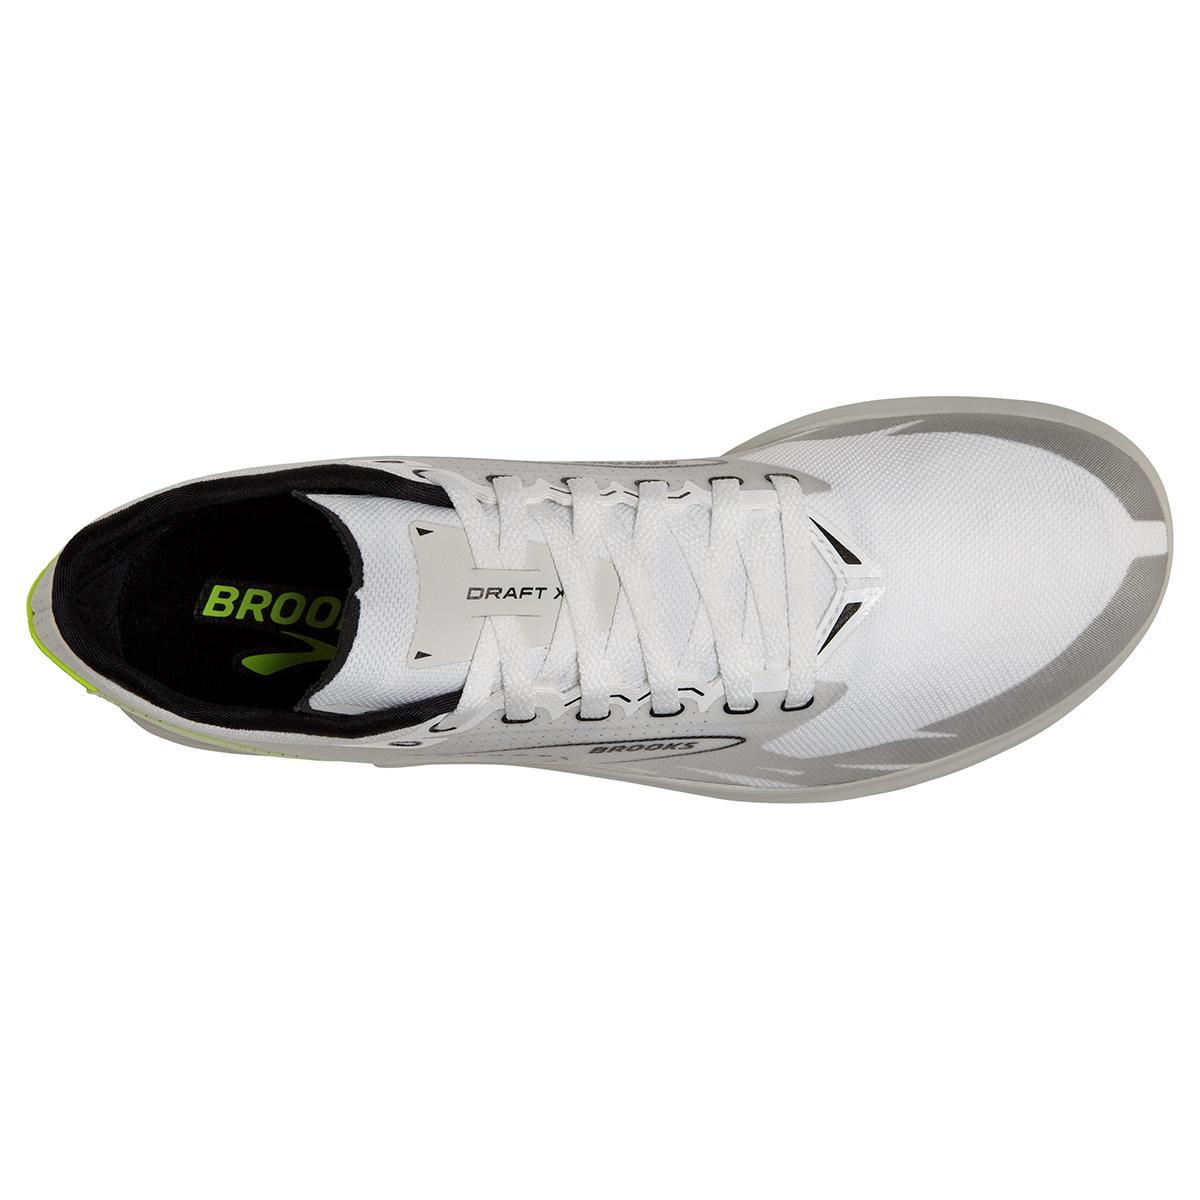 Brooks Launch XC - Color: White/Black/Nightlife - Size: M4/W5.5 - Width: Regular, White/Black/Nightlife, large, image 3